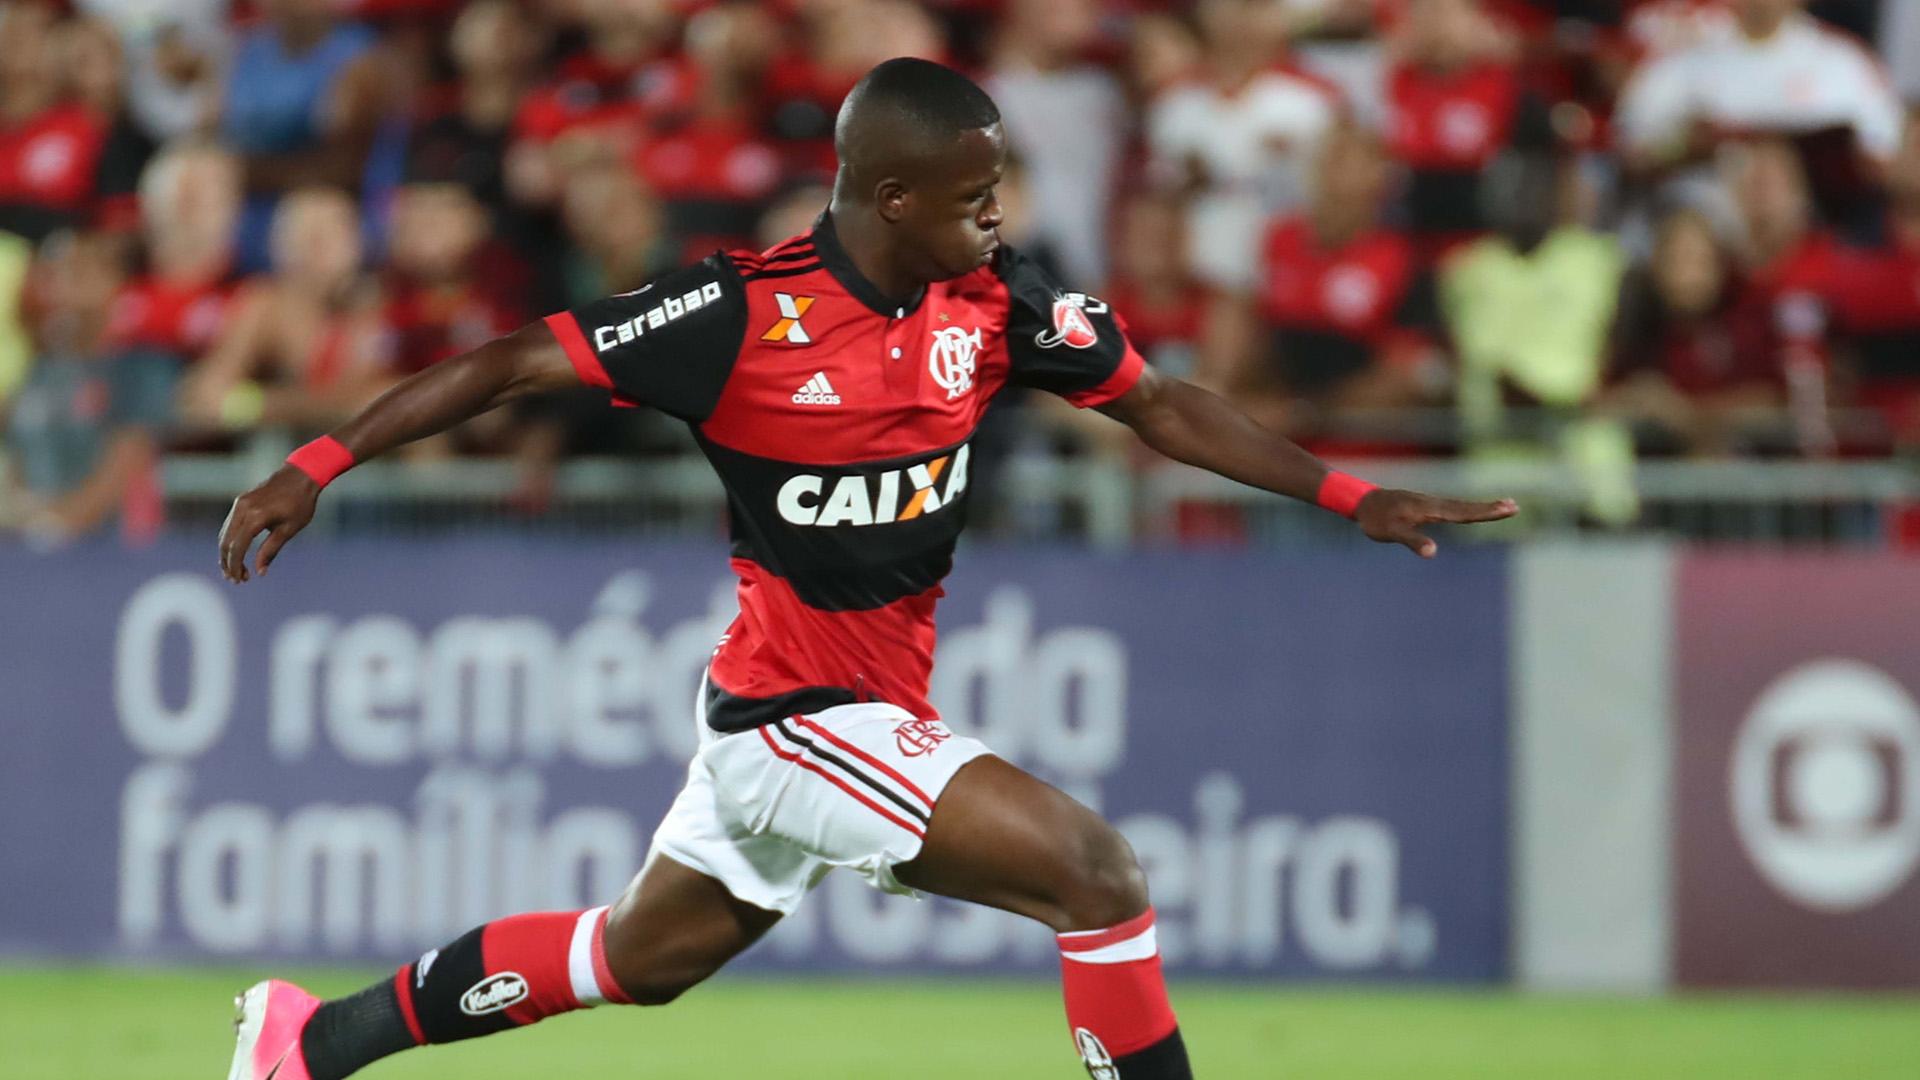 Vinicius Junior Flamengo Chapecoense Brasileirao Serie A 22062017